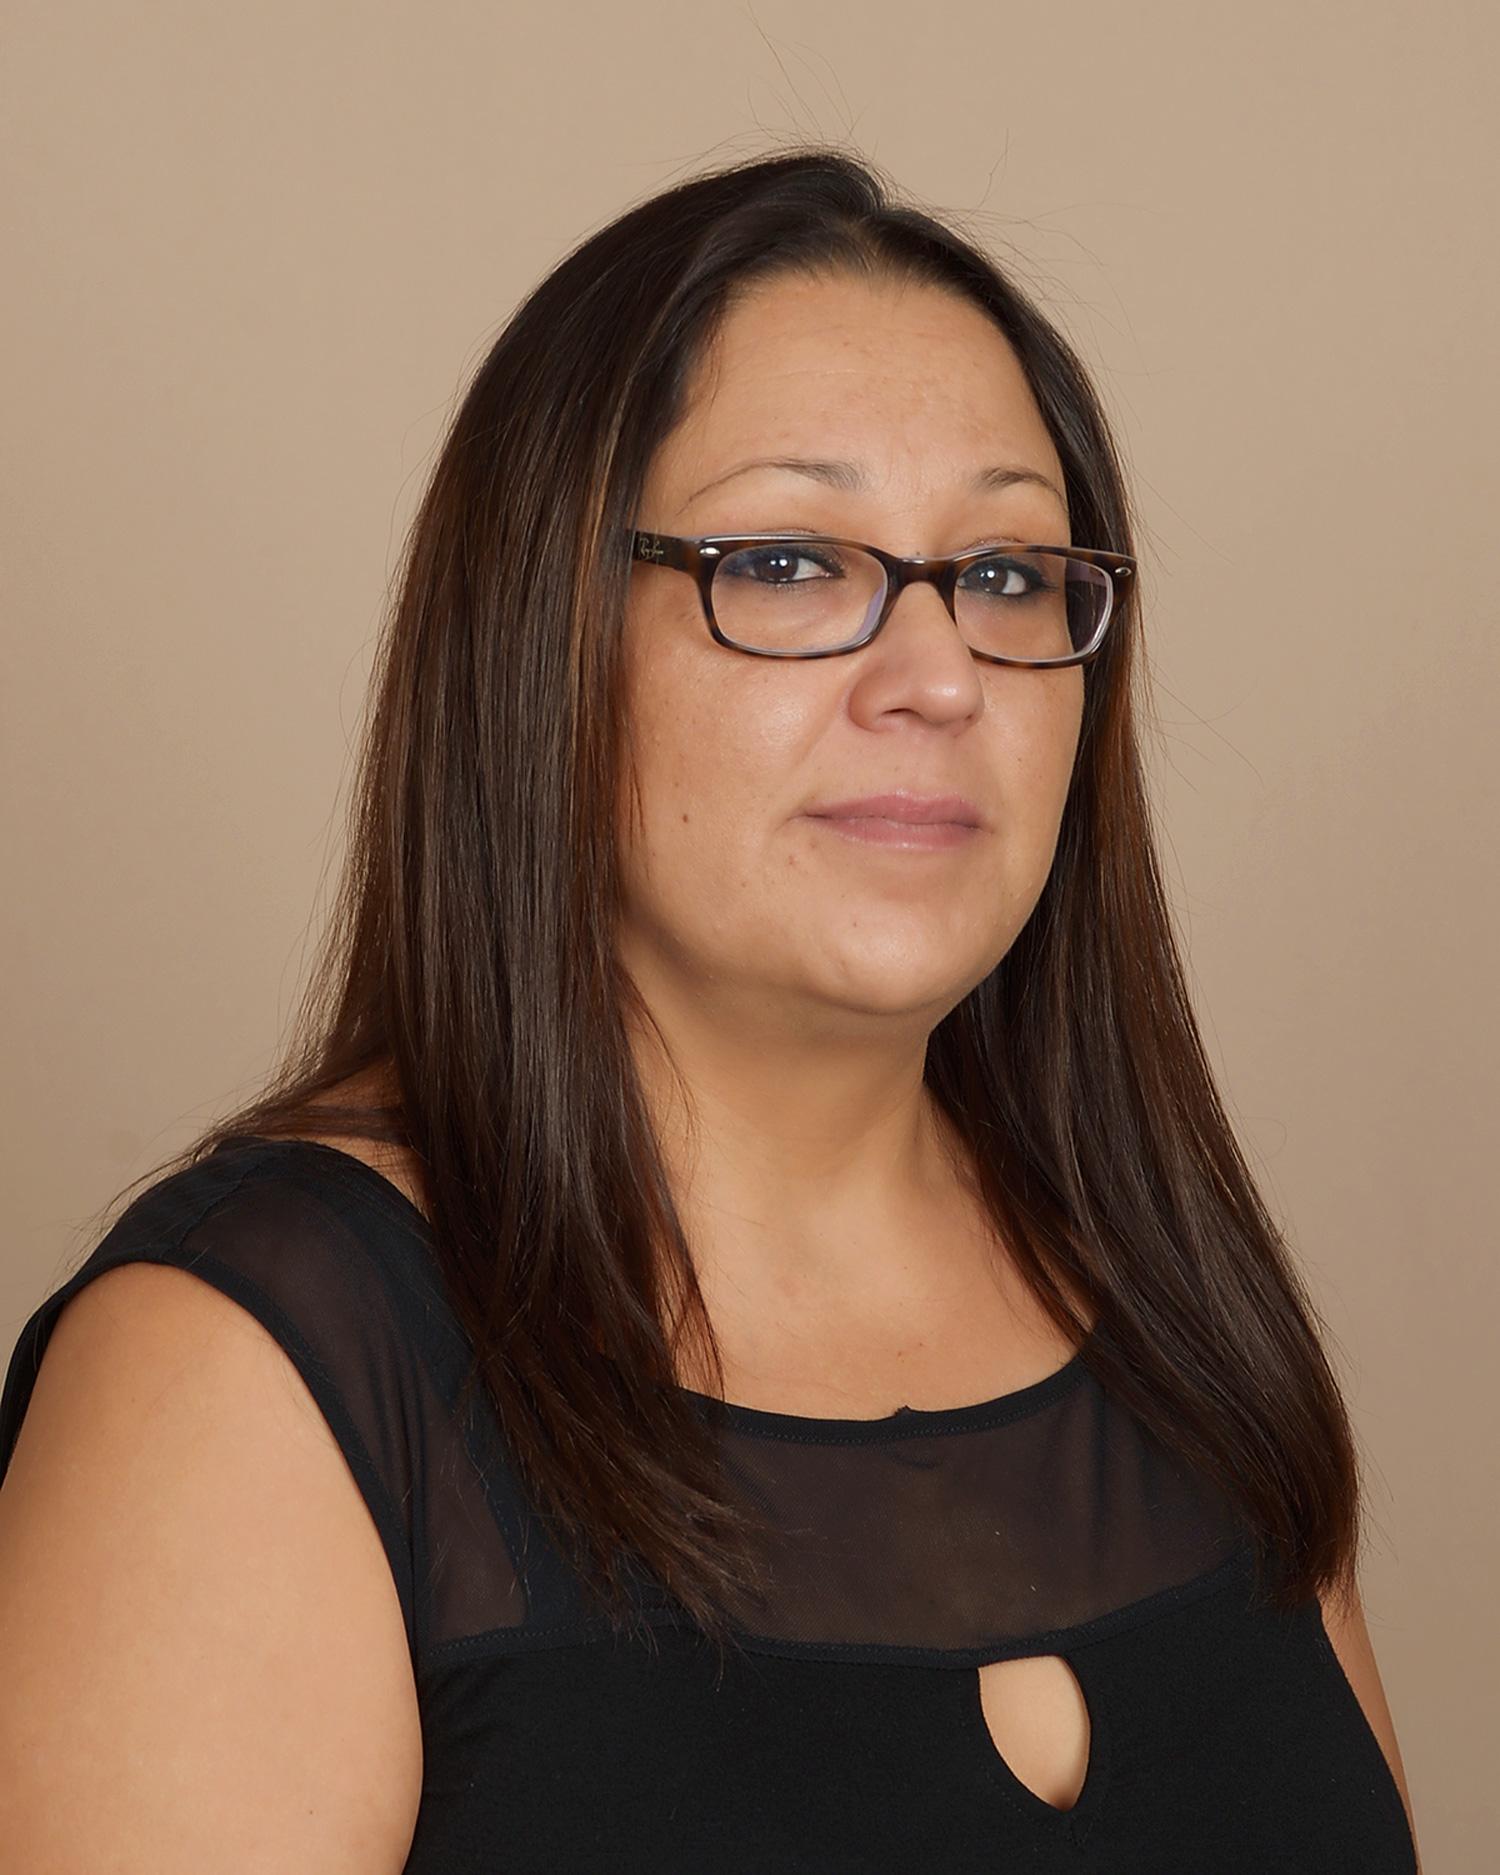 Laura Montelongo